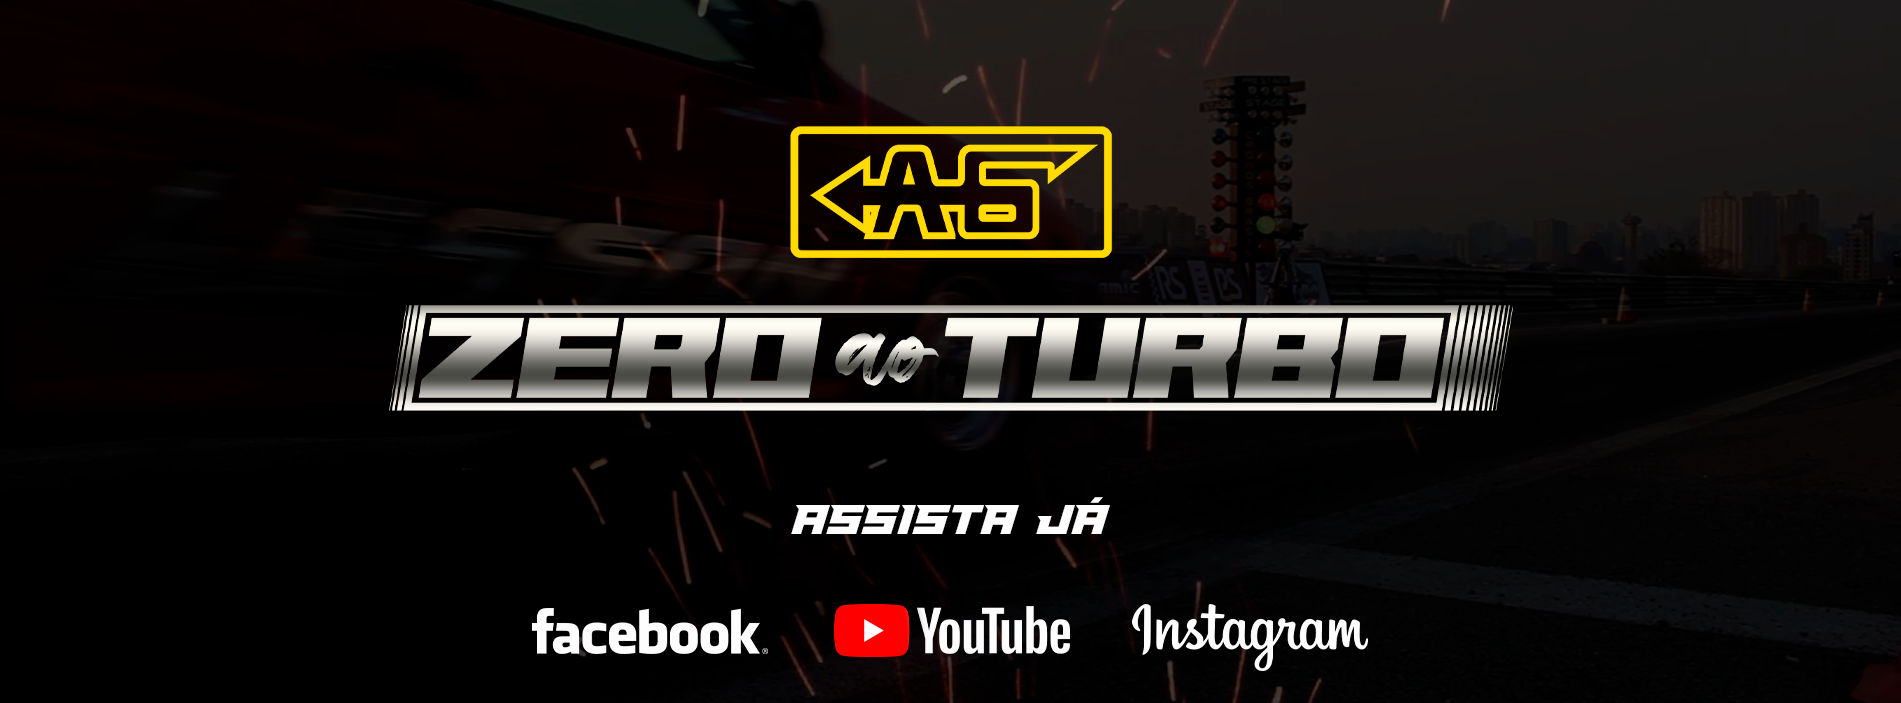 Do Zero ao Turbo